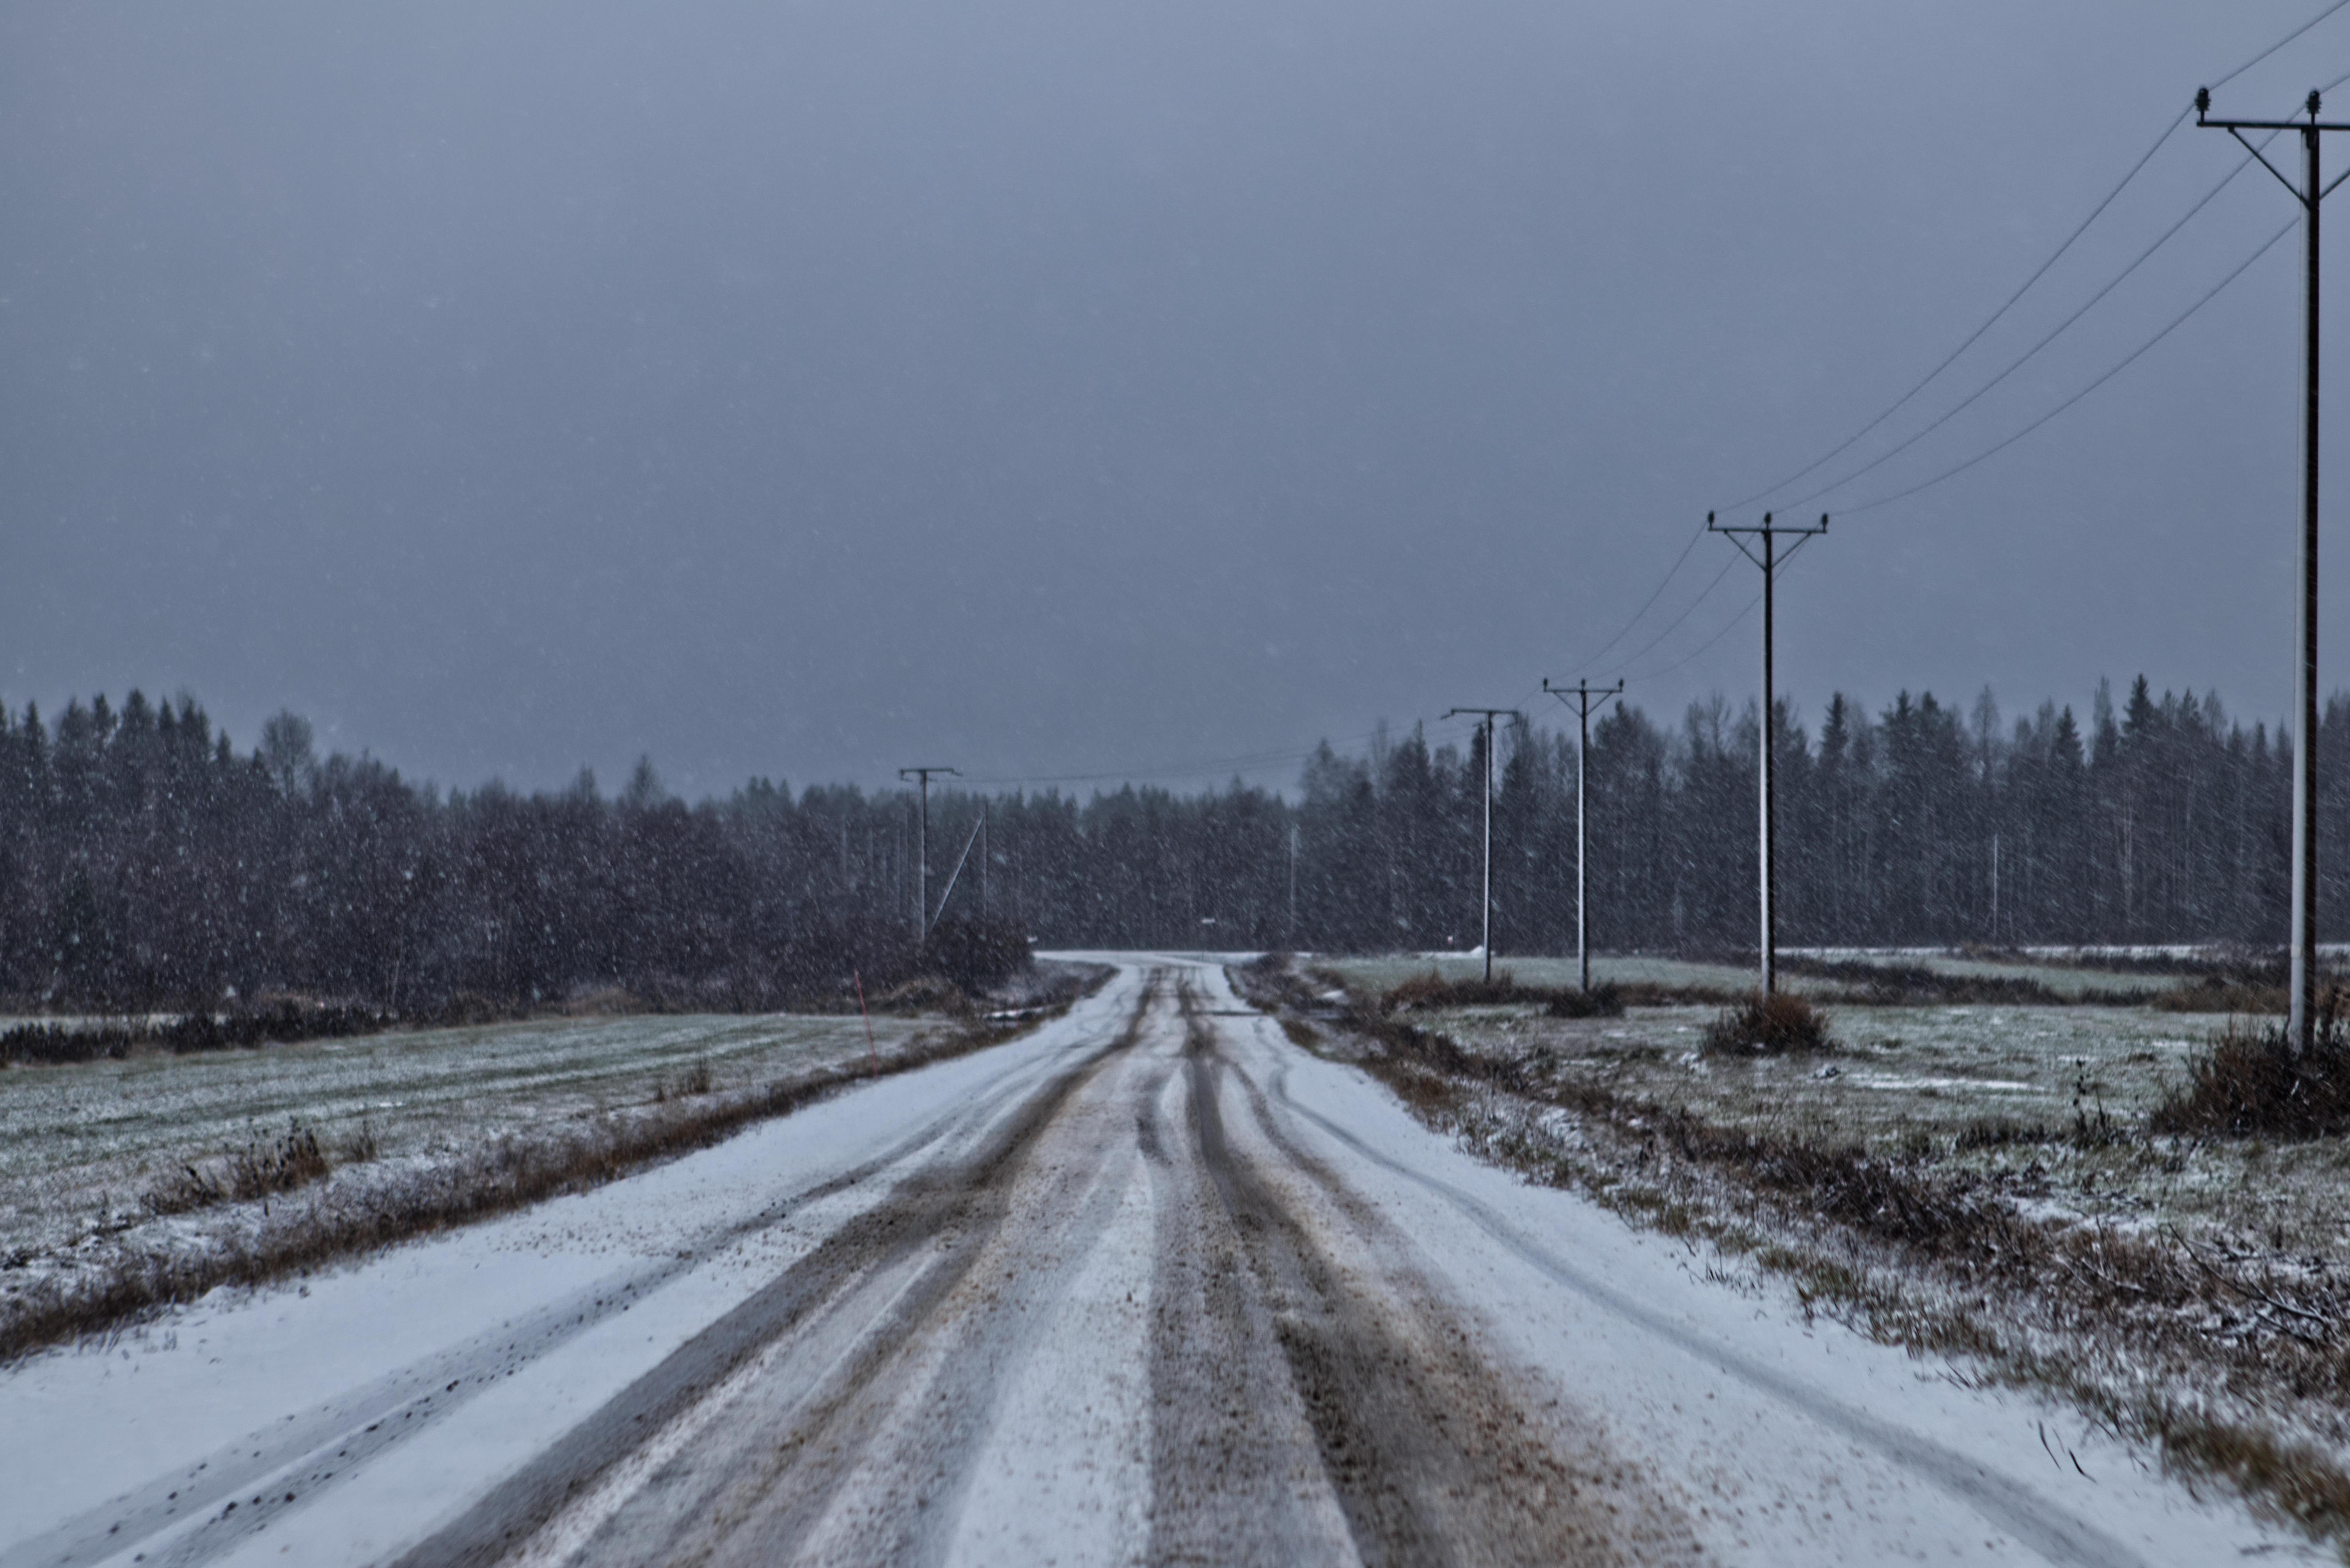 Road with Snow, Image taken in Rovaniemi, Finland, Copyright Frederik Kammel